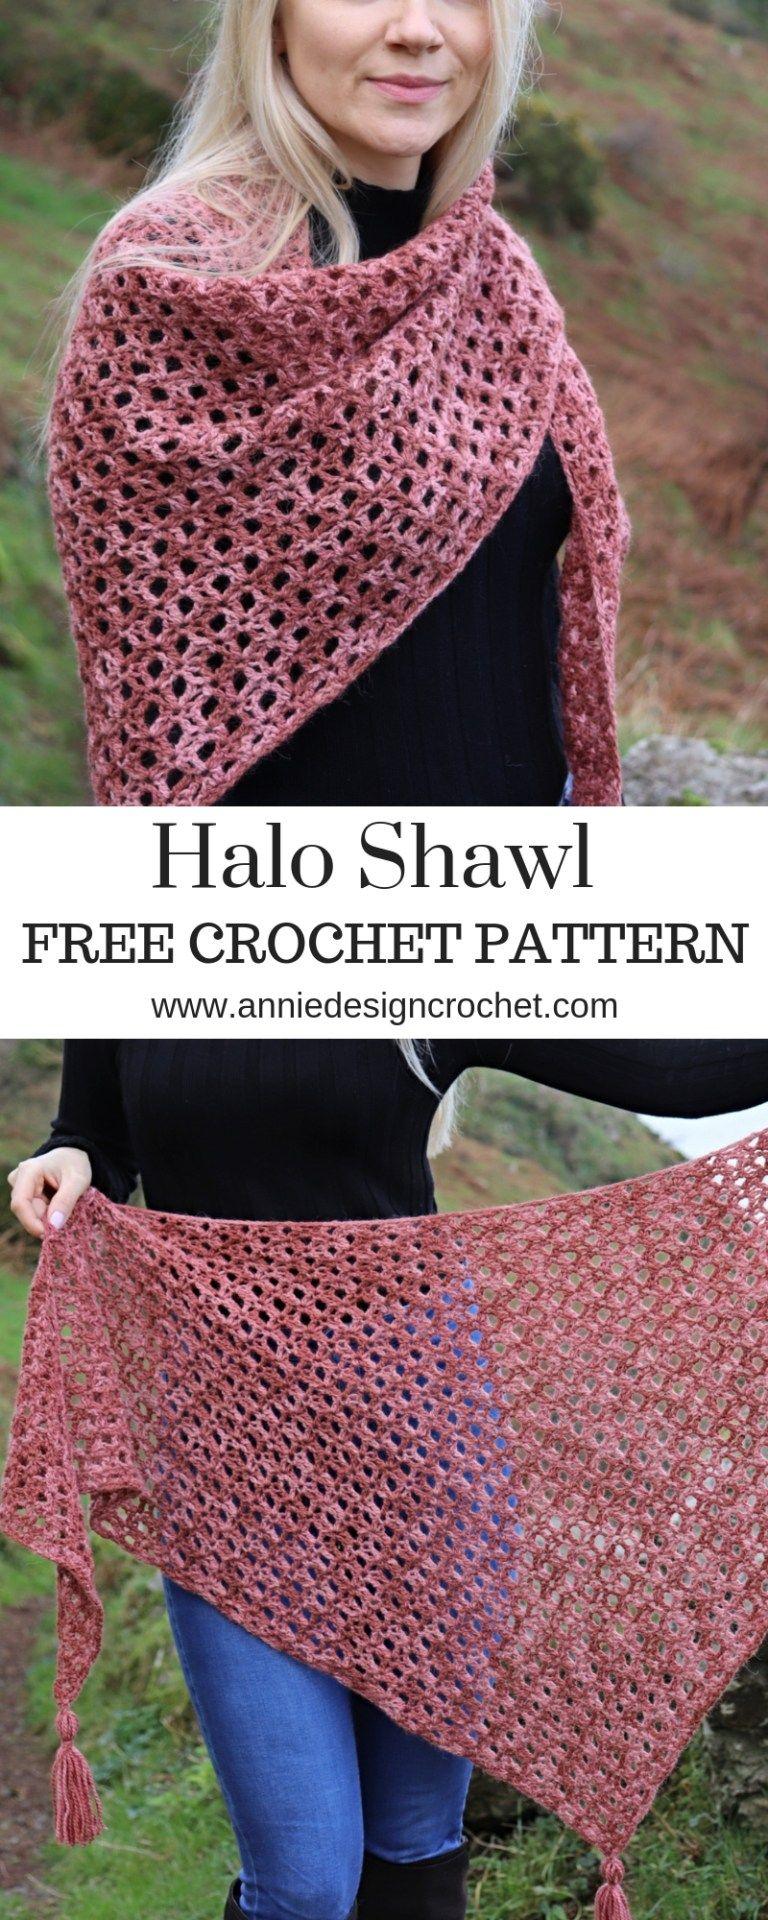 Halo Shawl – Free Crochet Shawl Pattern - Crochet Shawl